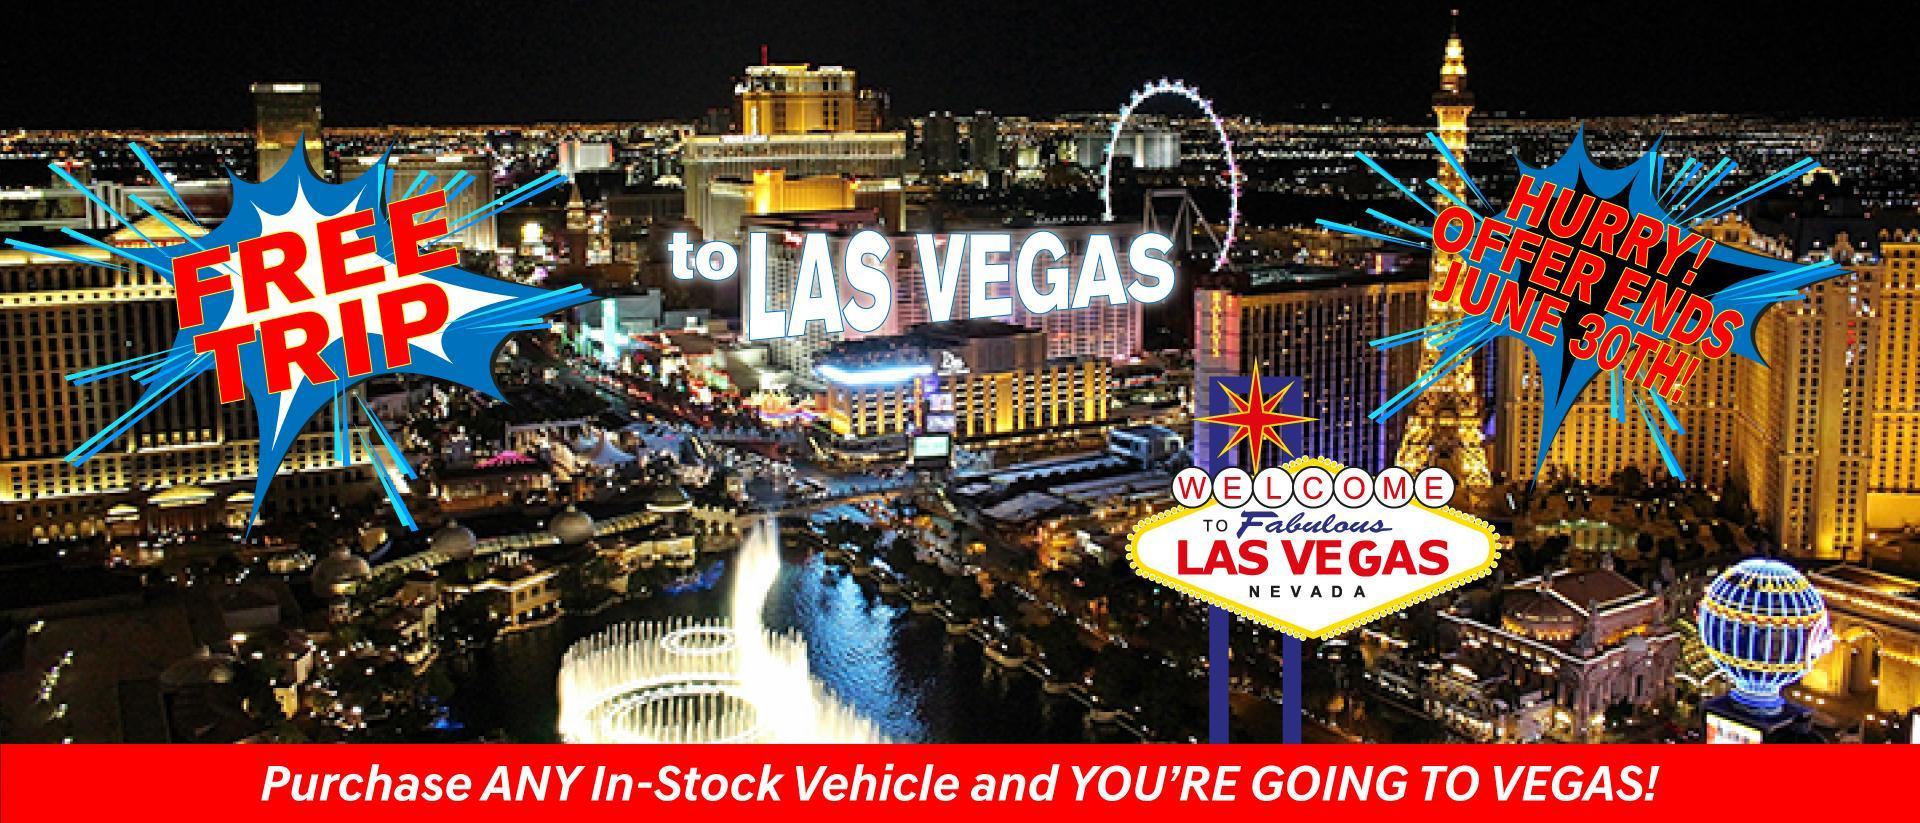 CRH-Vegas Promo